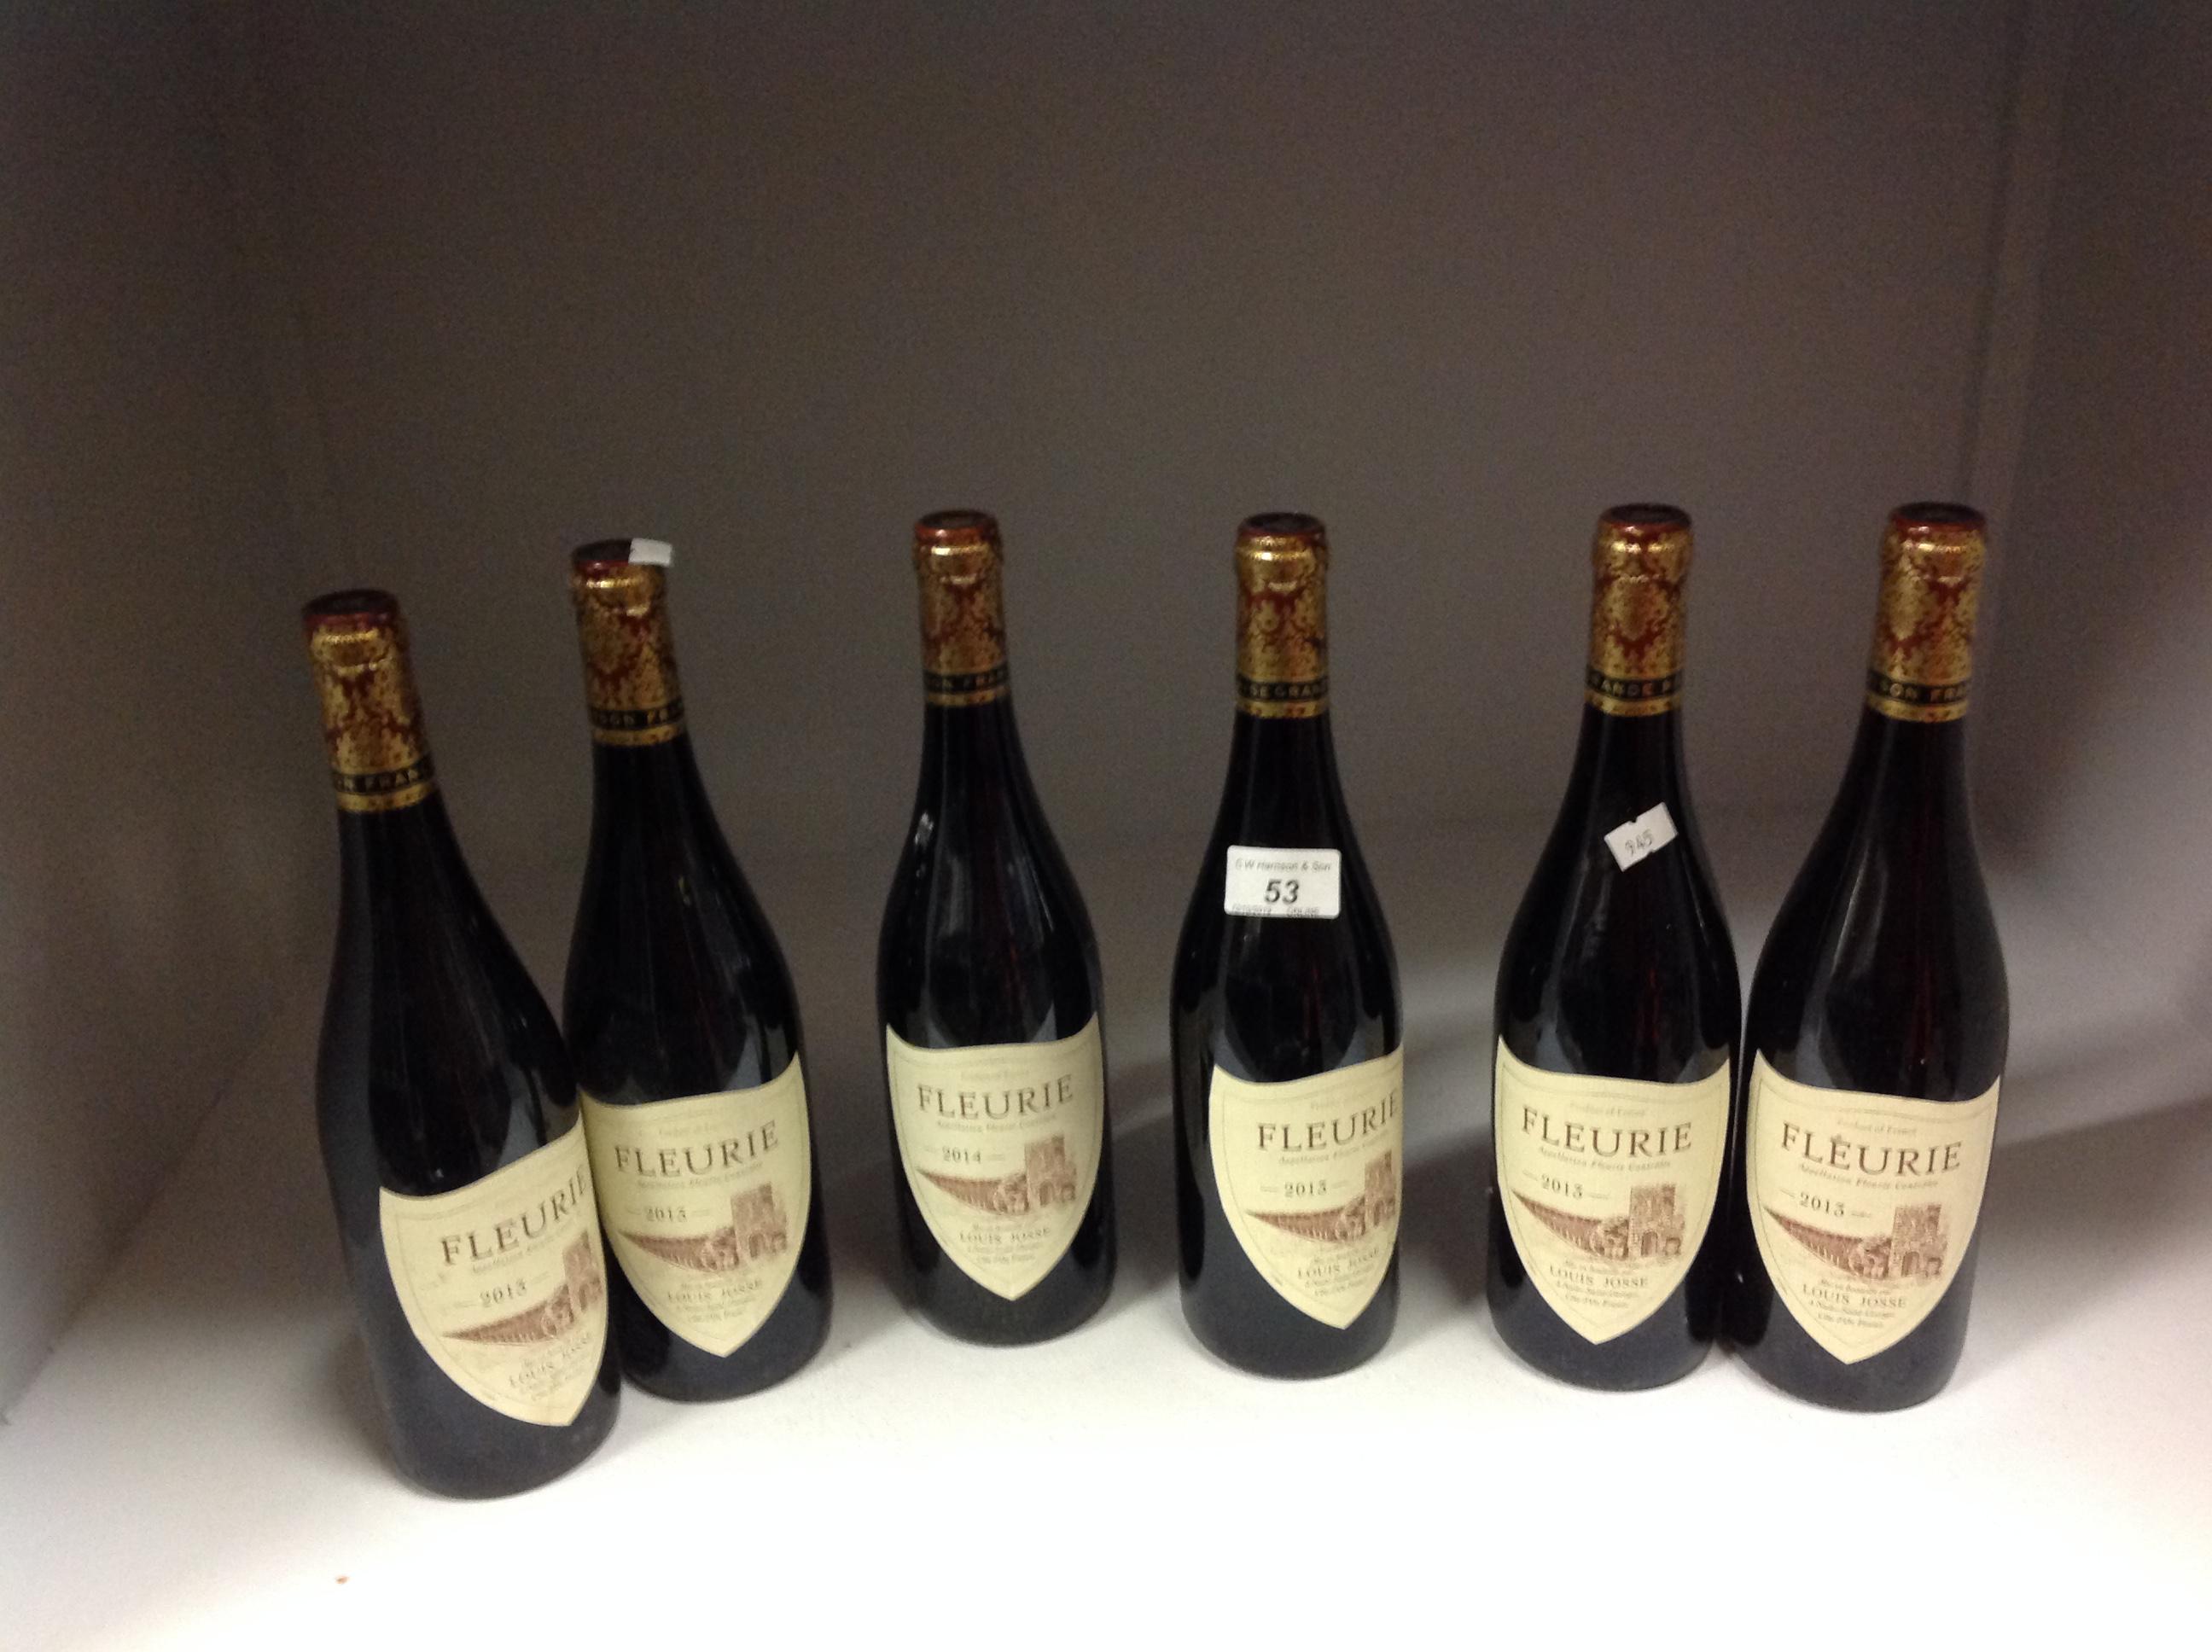 6 x 750ml bottles Louis Josse Fleurie - Image 2 of 2